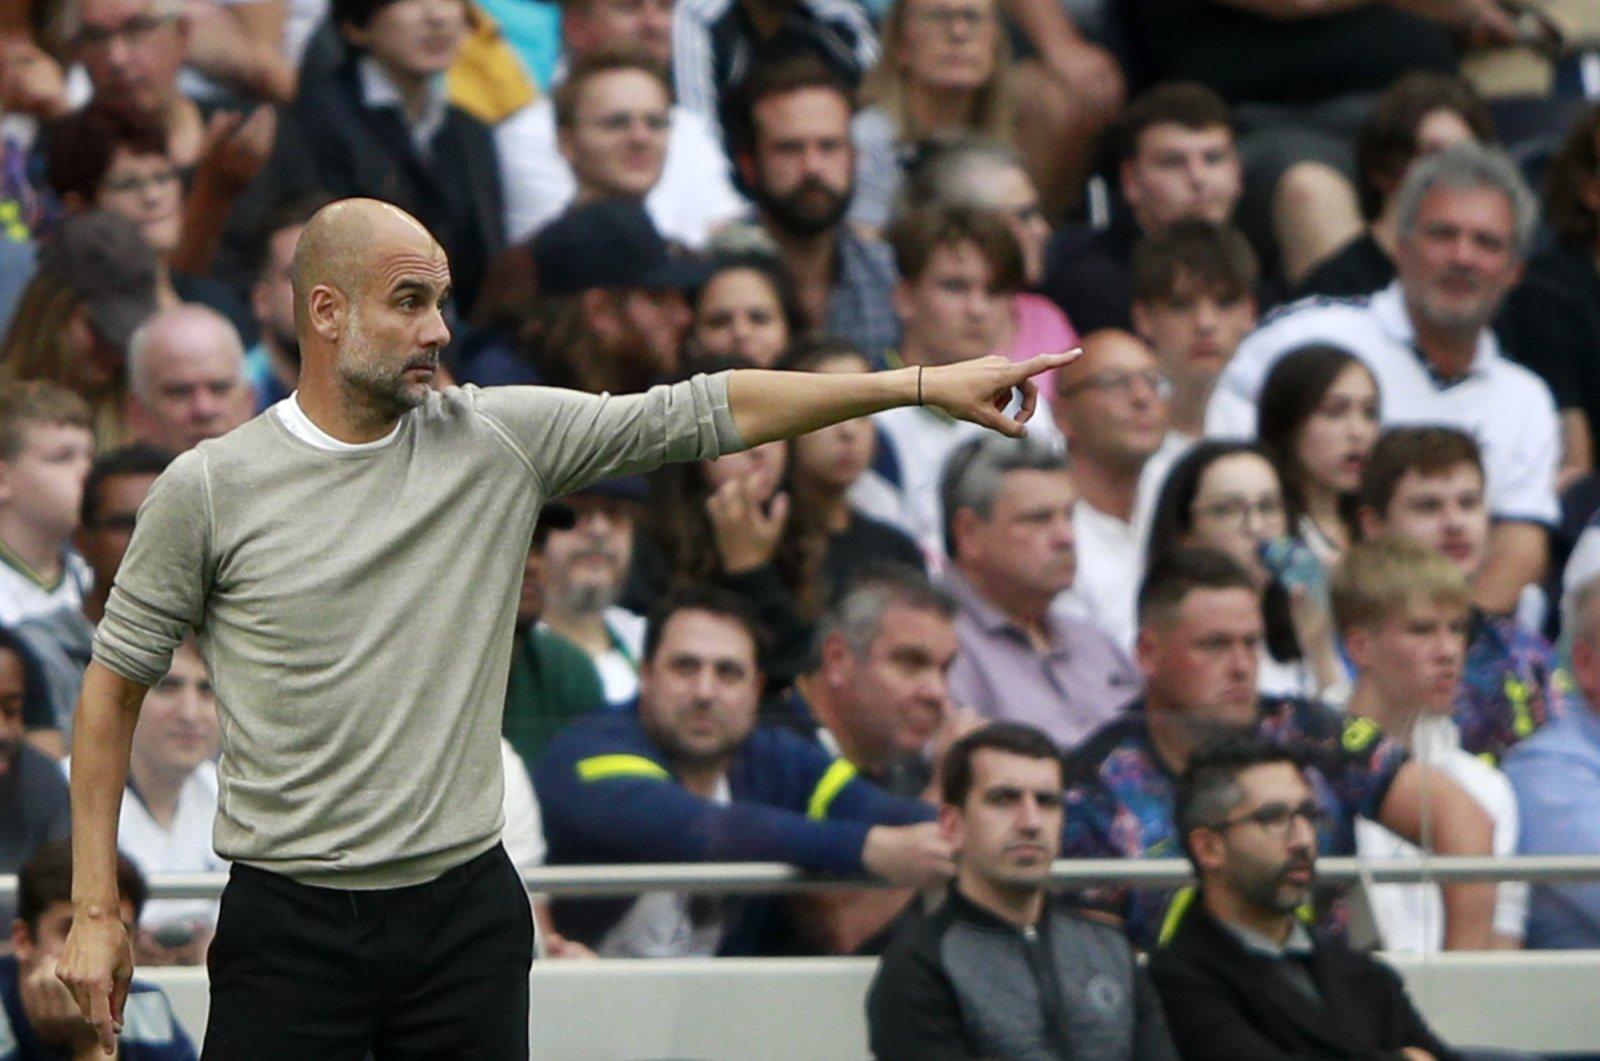 Manchester City's manager Pep Guardiola reacts during a Premier League match against Tottenham Hotspur in London, England, Aug. 15, 2021. (AP Photo)